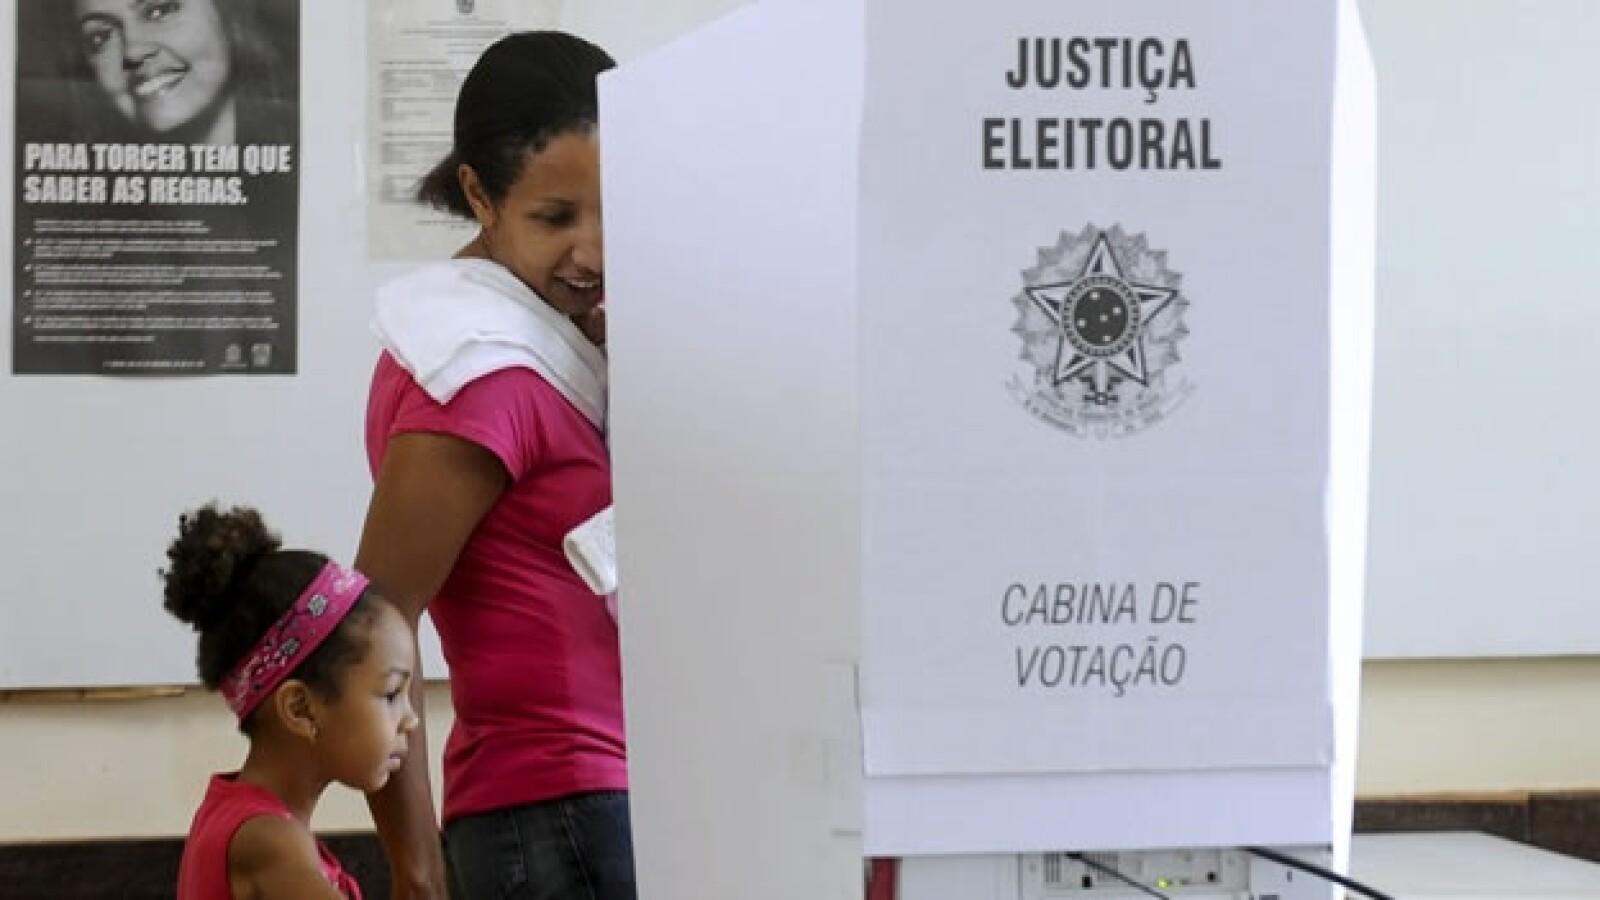 una mujer vota en brasil